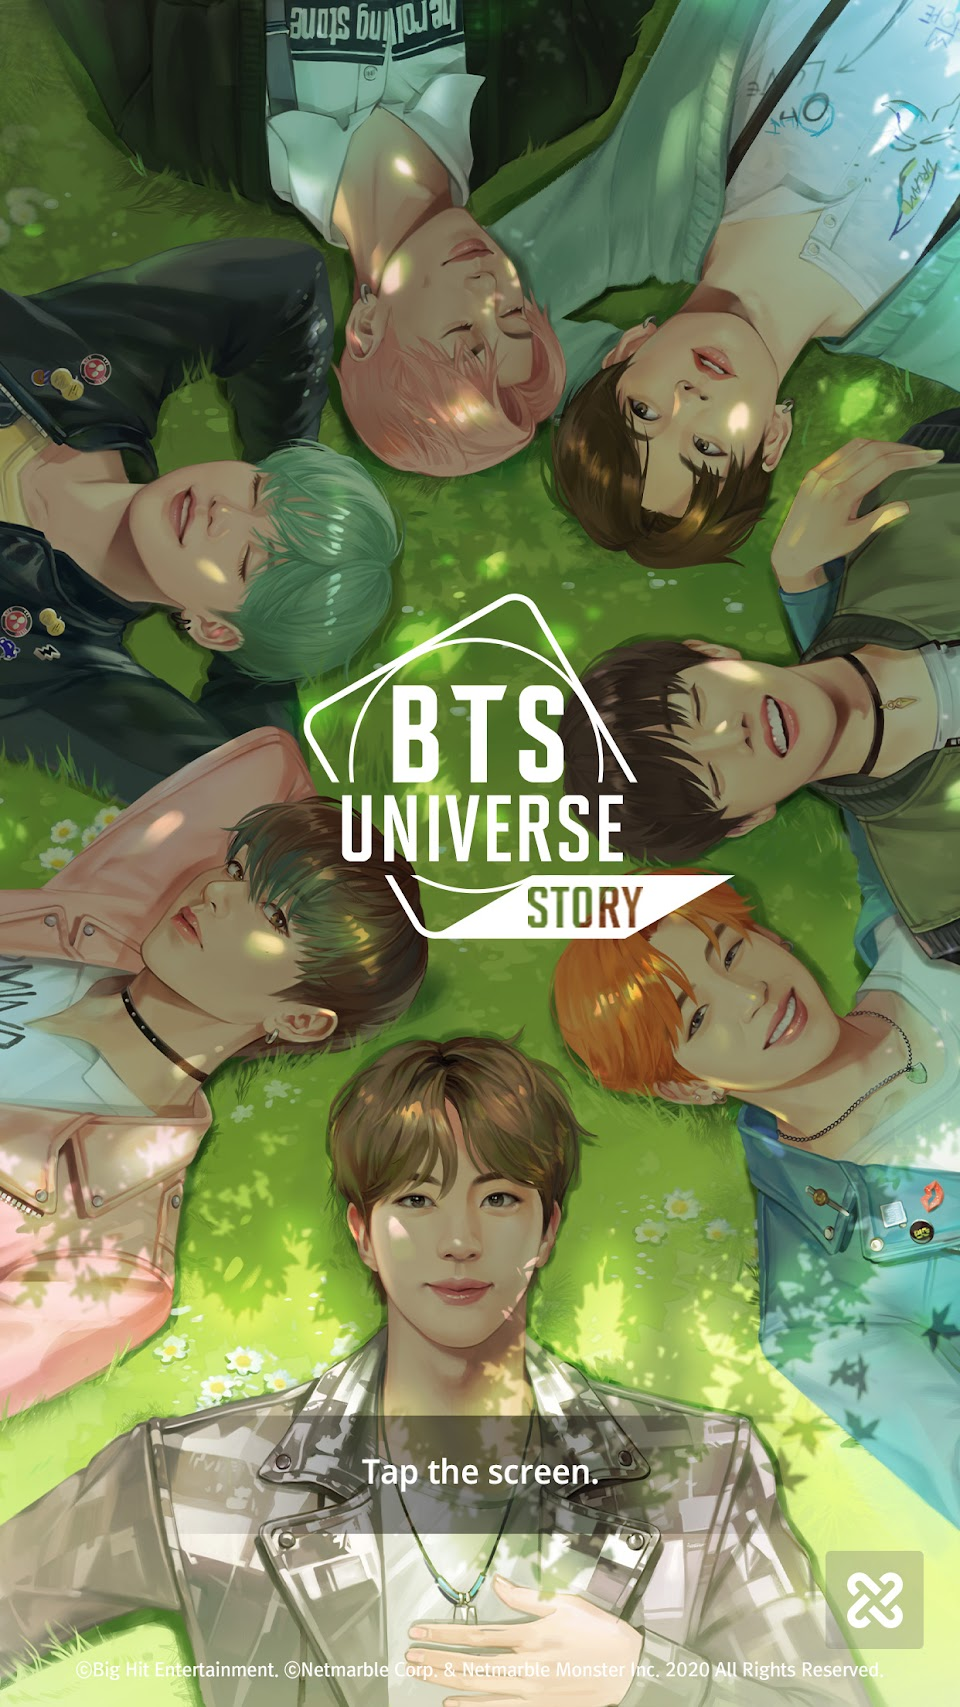 BTS Universe Story Image - 1242x2208